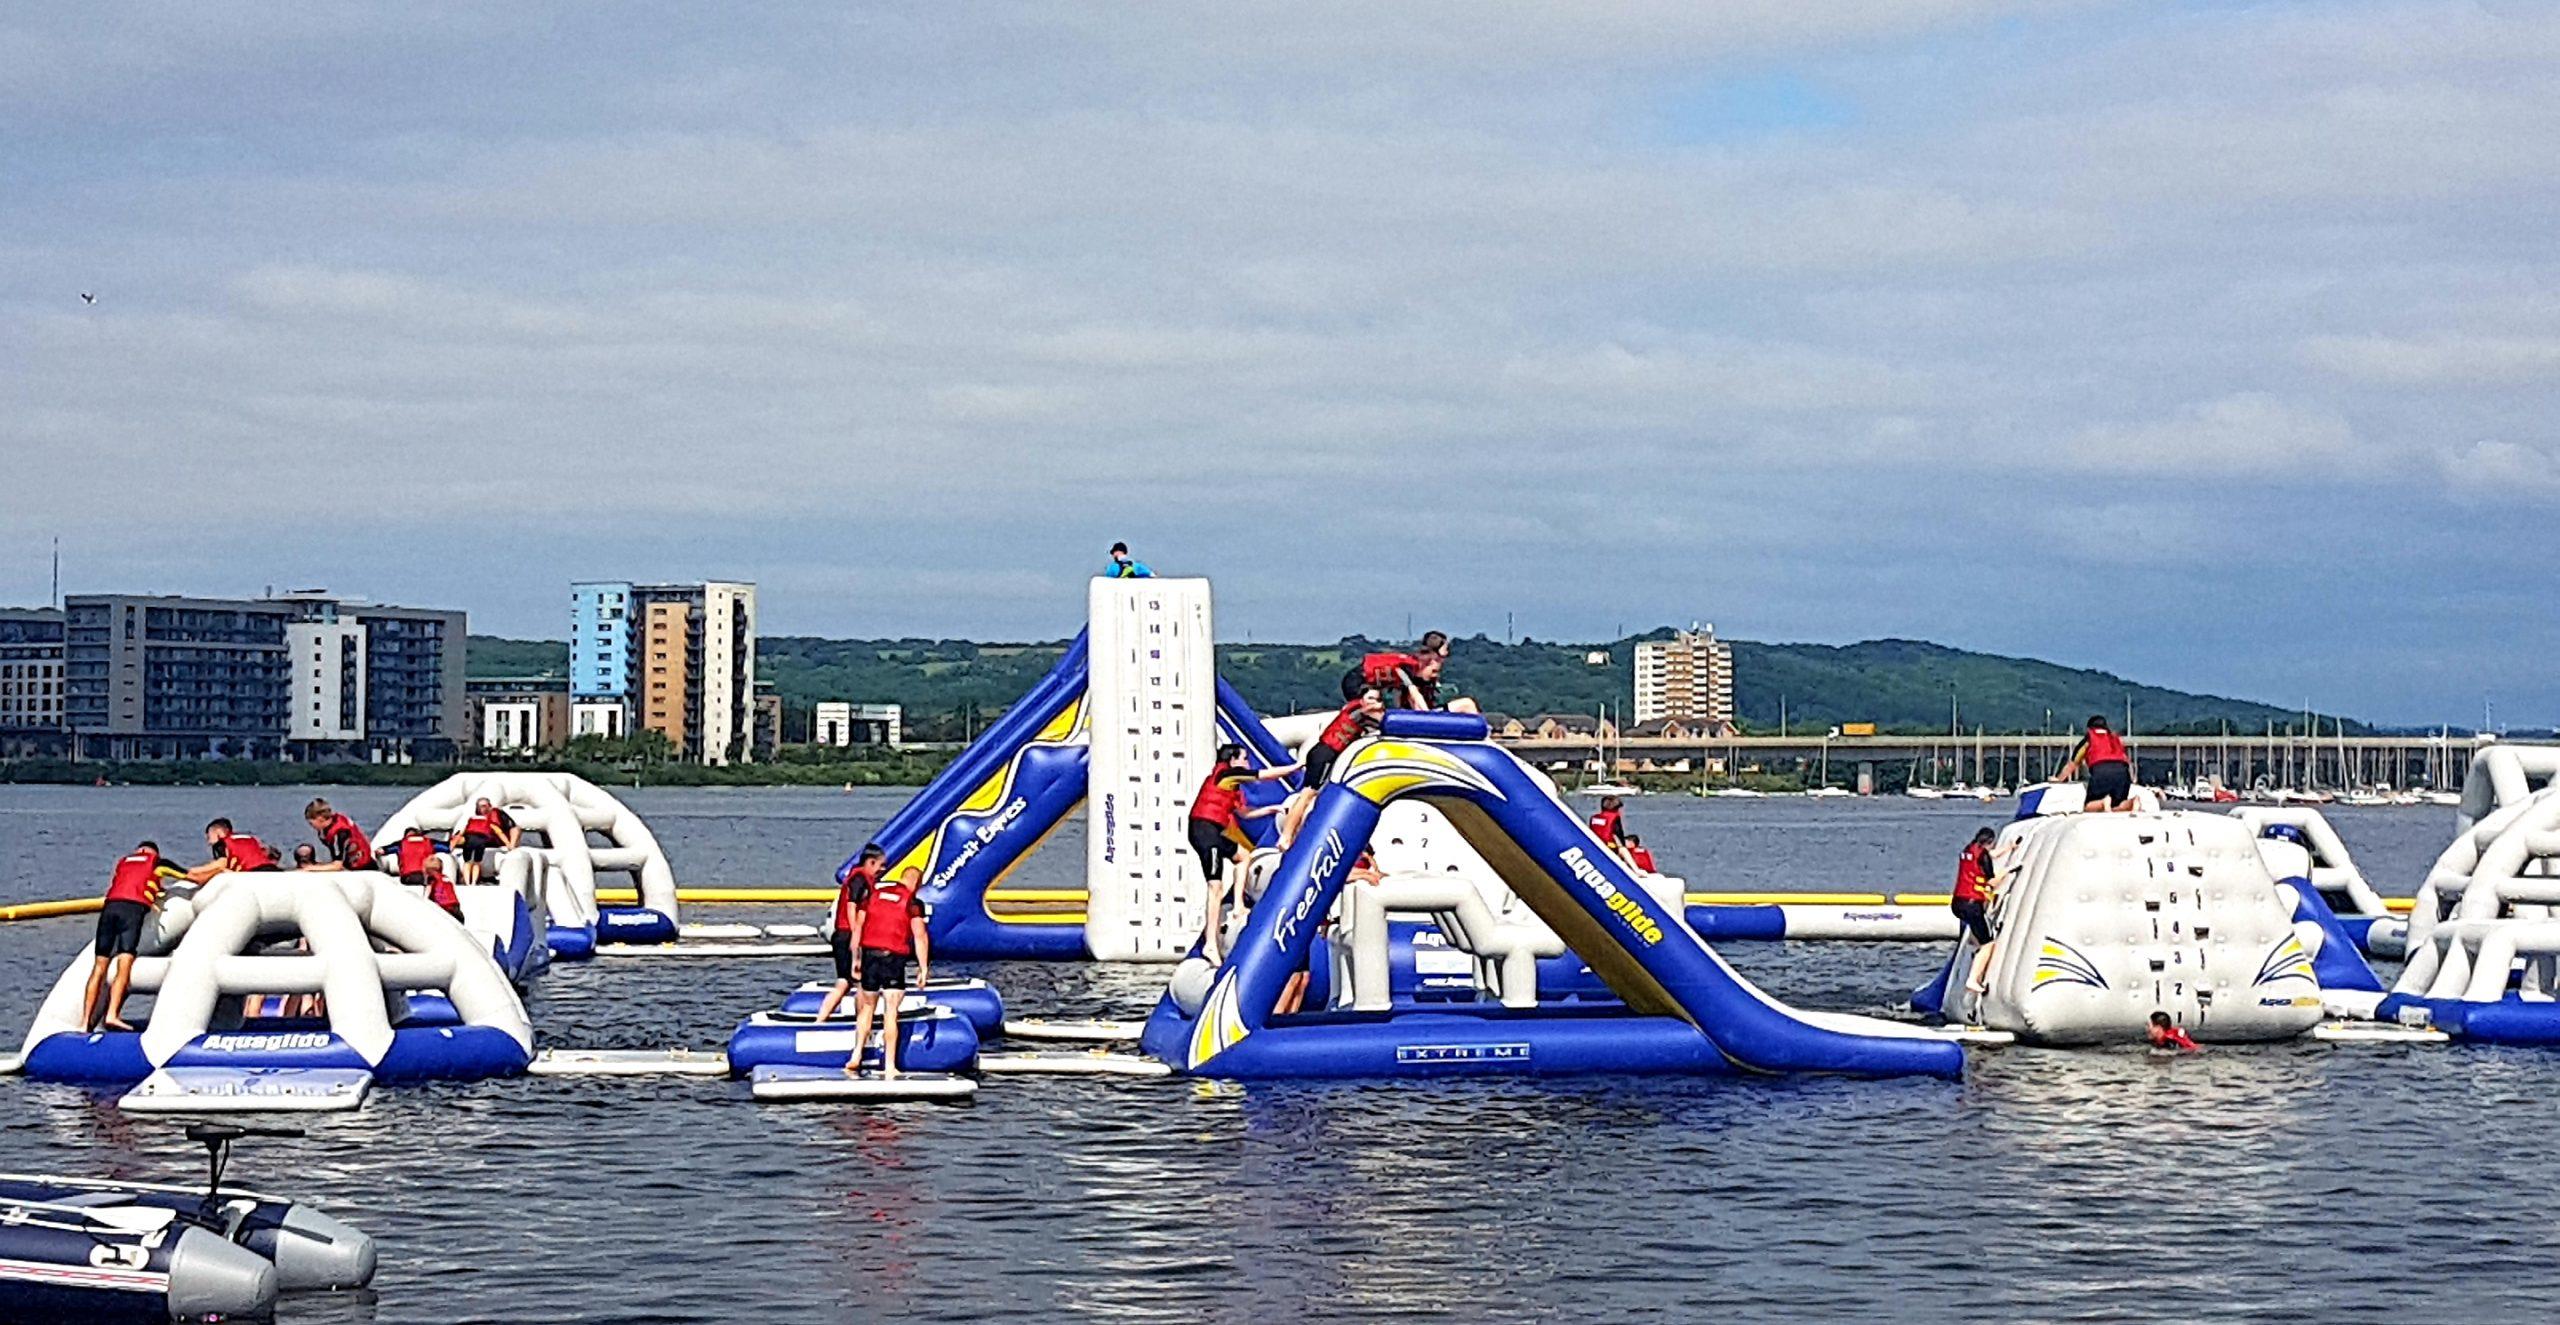 Fun at Aqua Park Cardiff